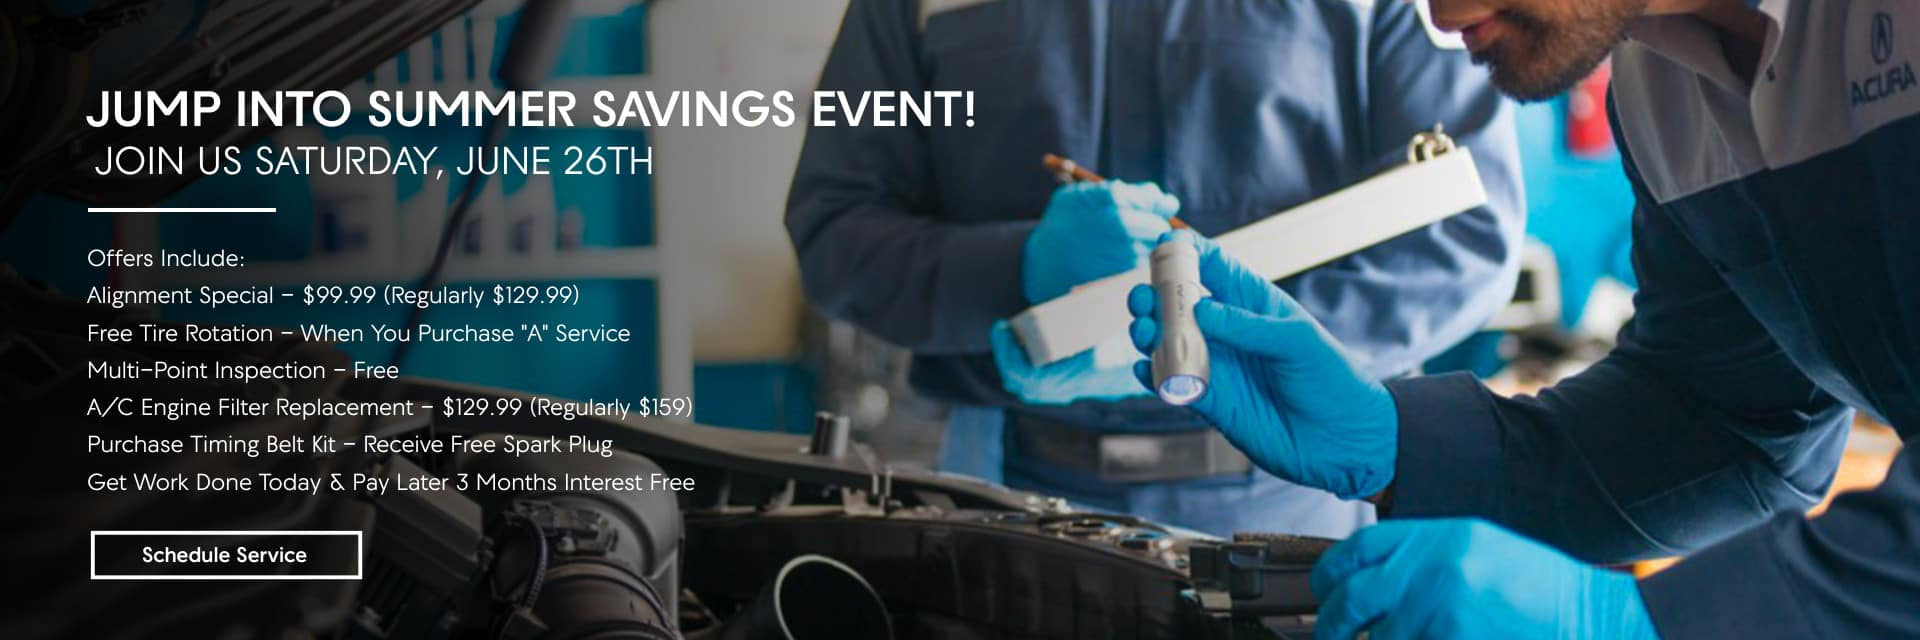 Jump Into Summer Savings Event!